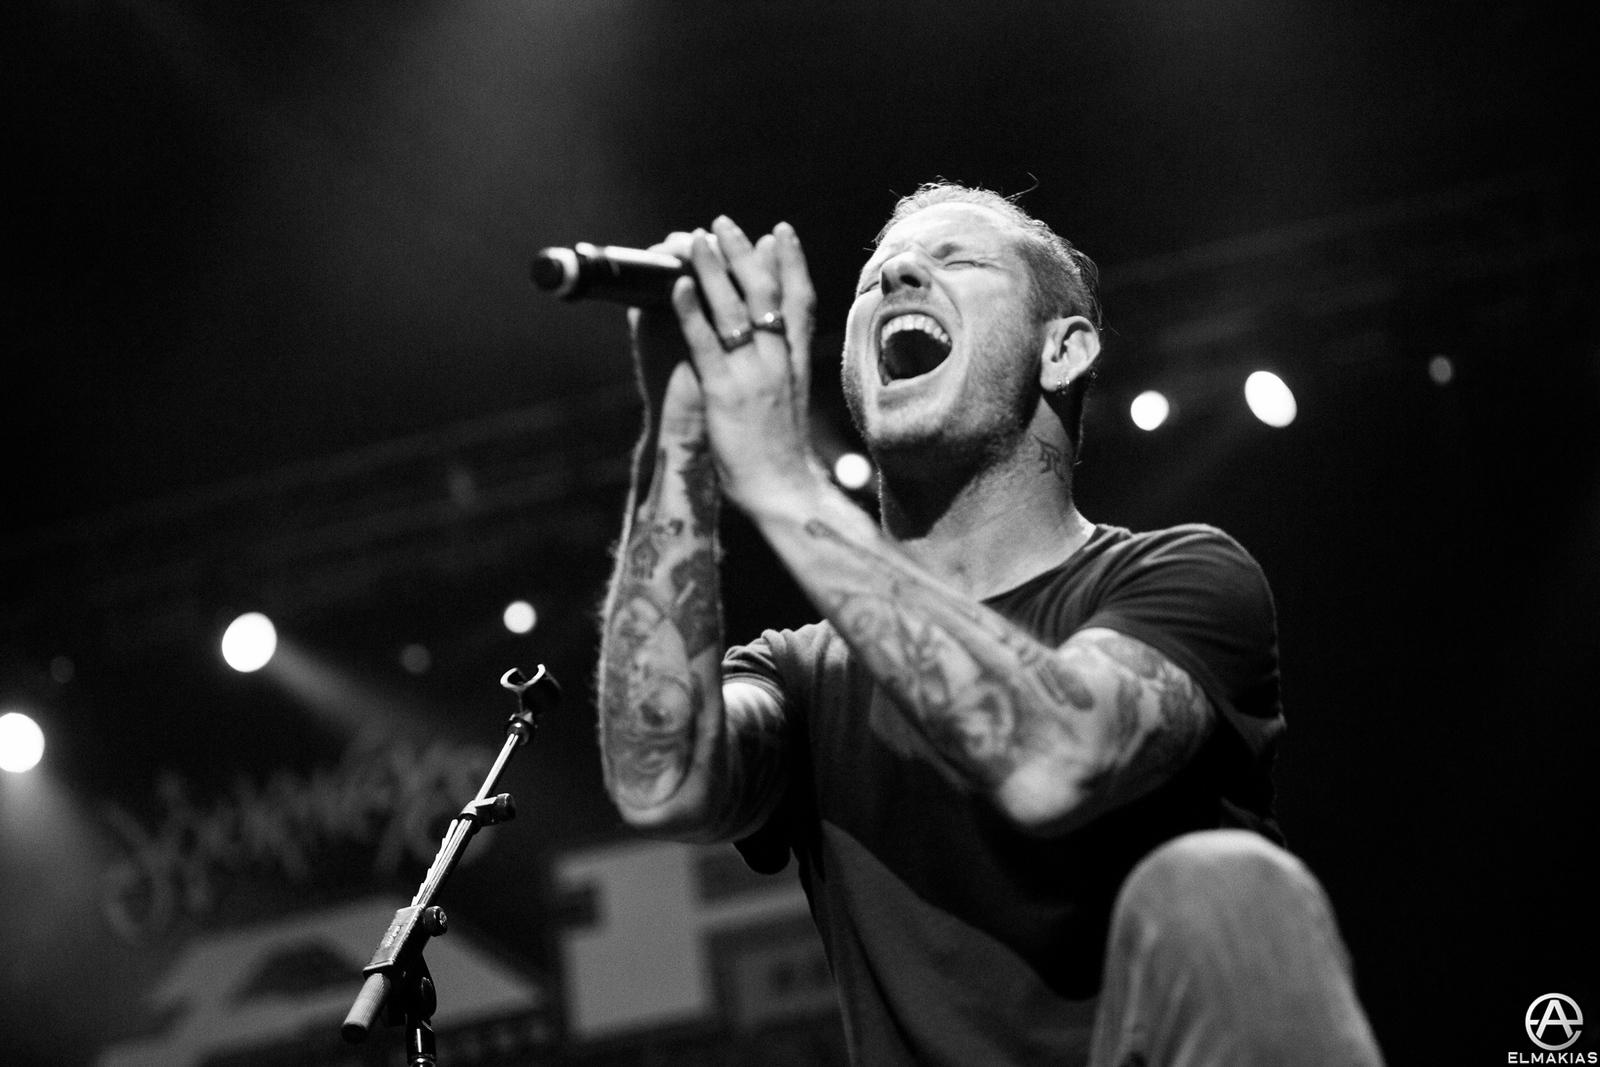 Corey Taylor of Slipknot with Halestorm at the Alternative Press Music Awards 2015 by Adam Elmakias